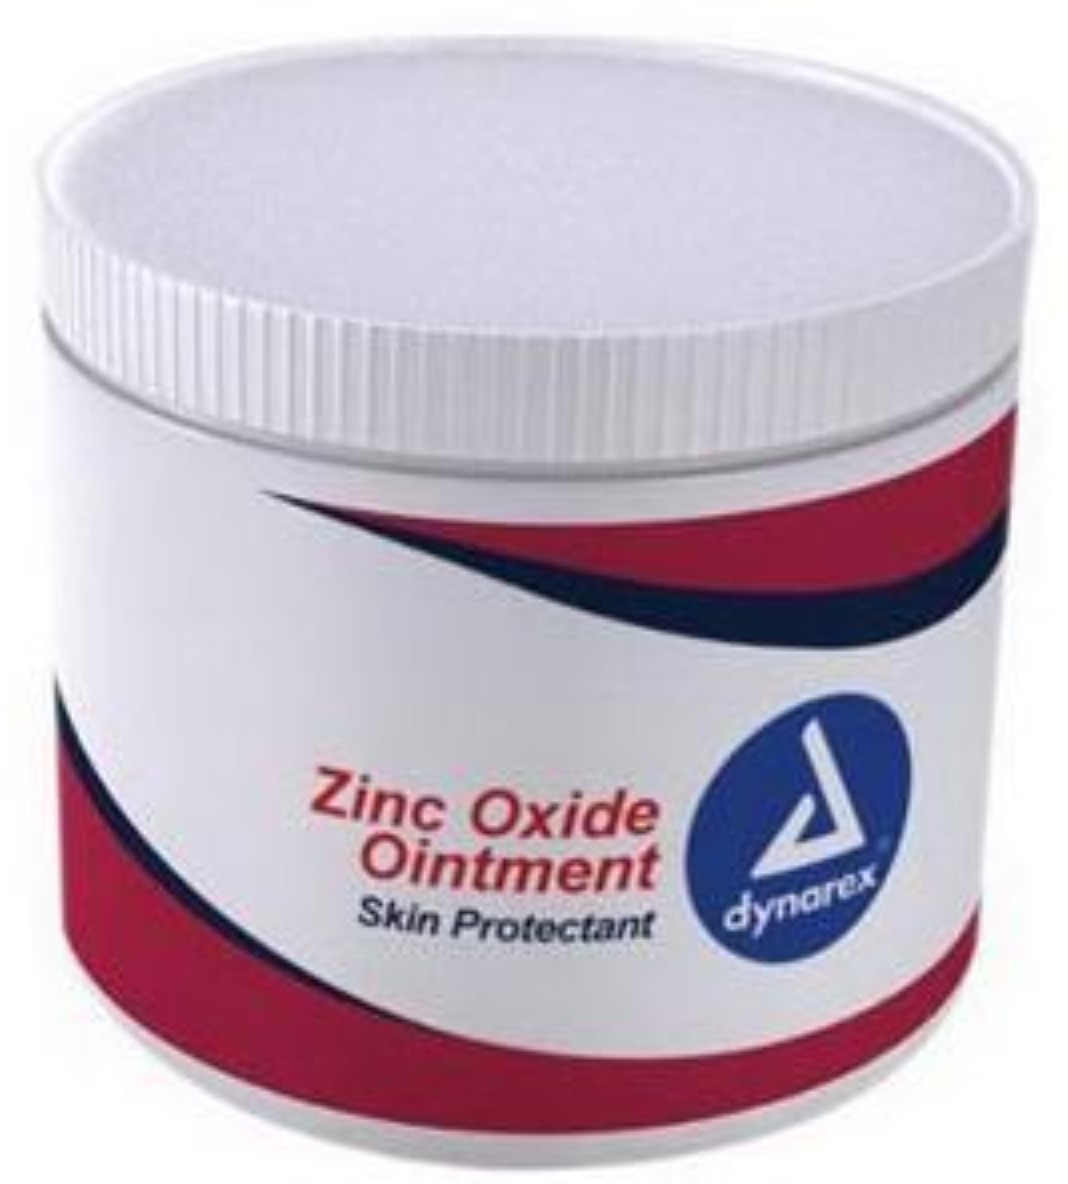 Dynarex Zinc Oxide Ointment 15 oz jar - 1 ea